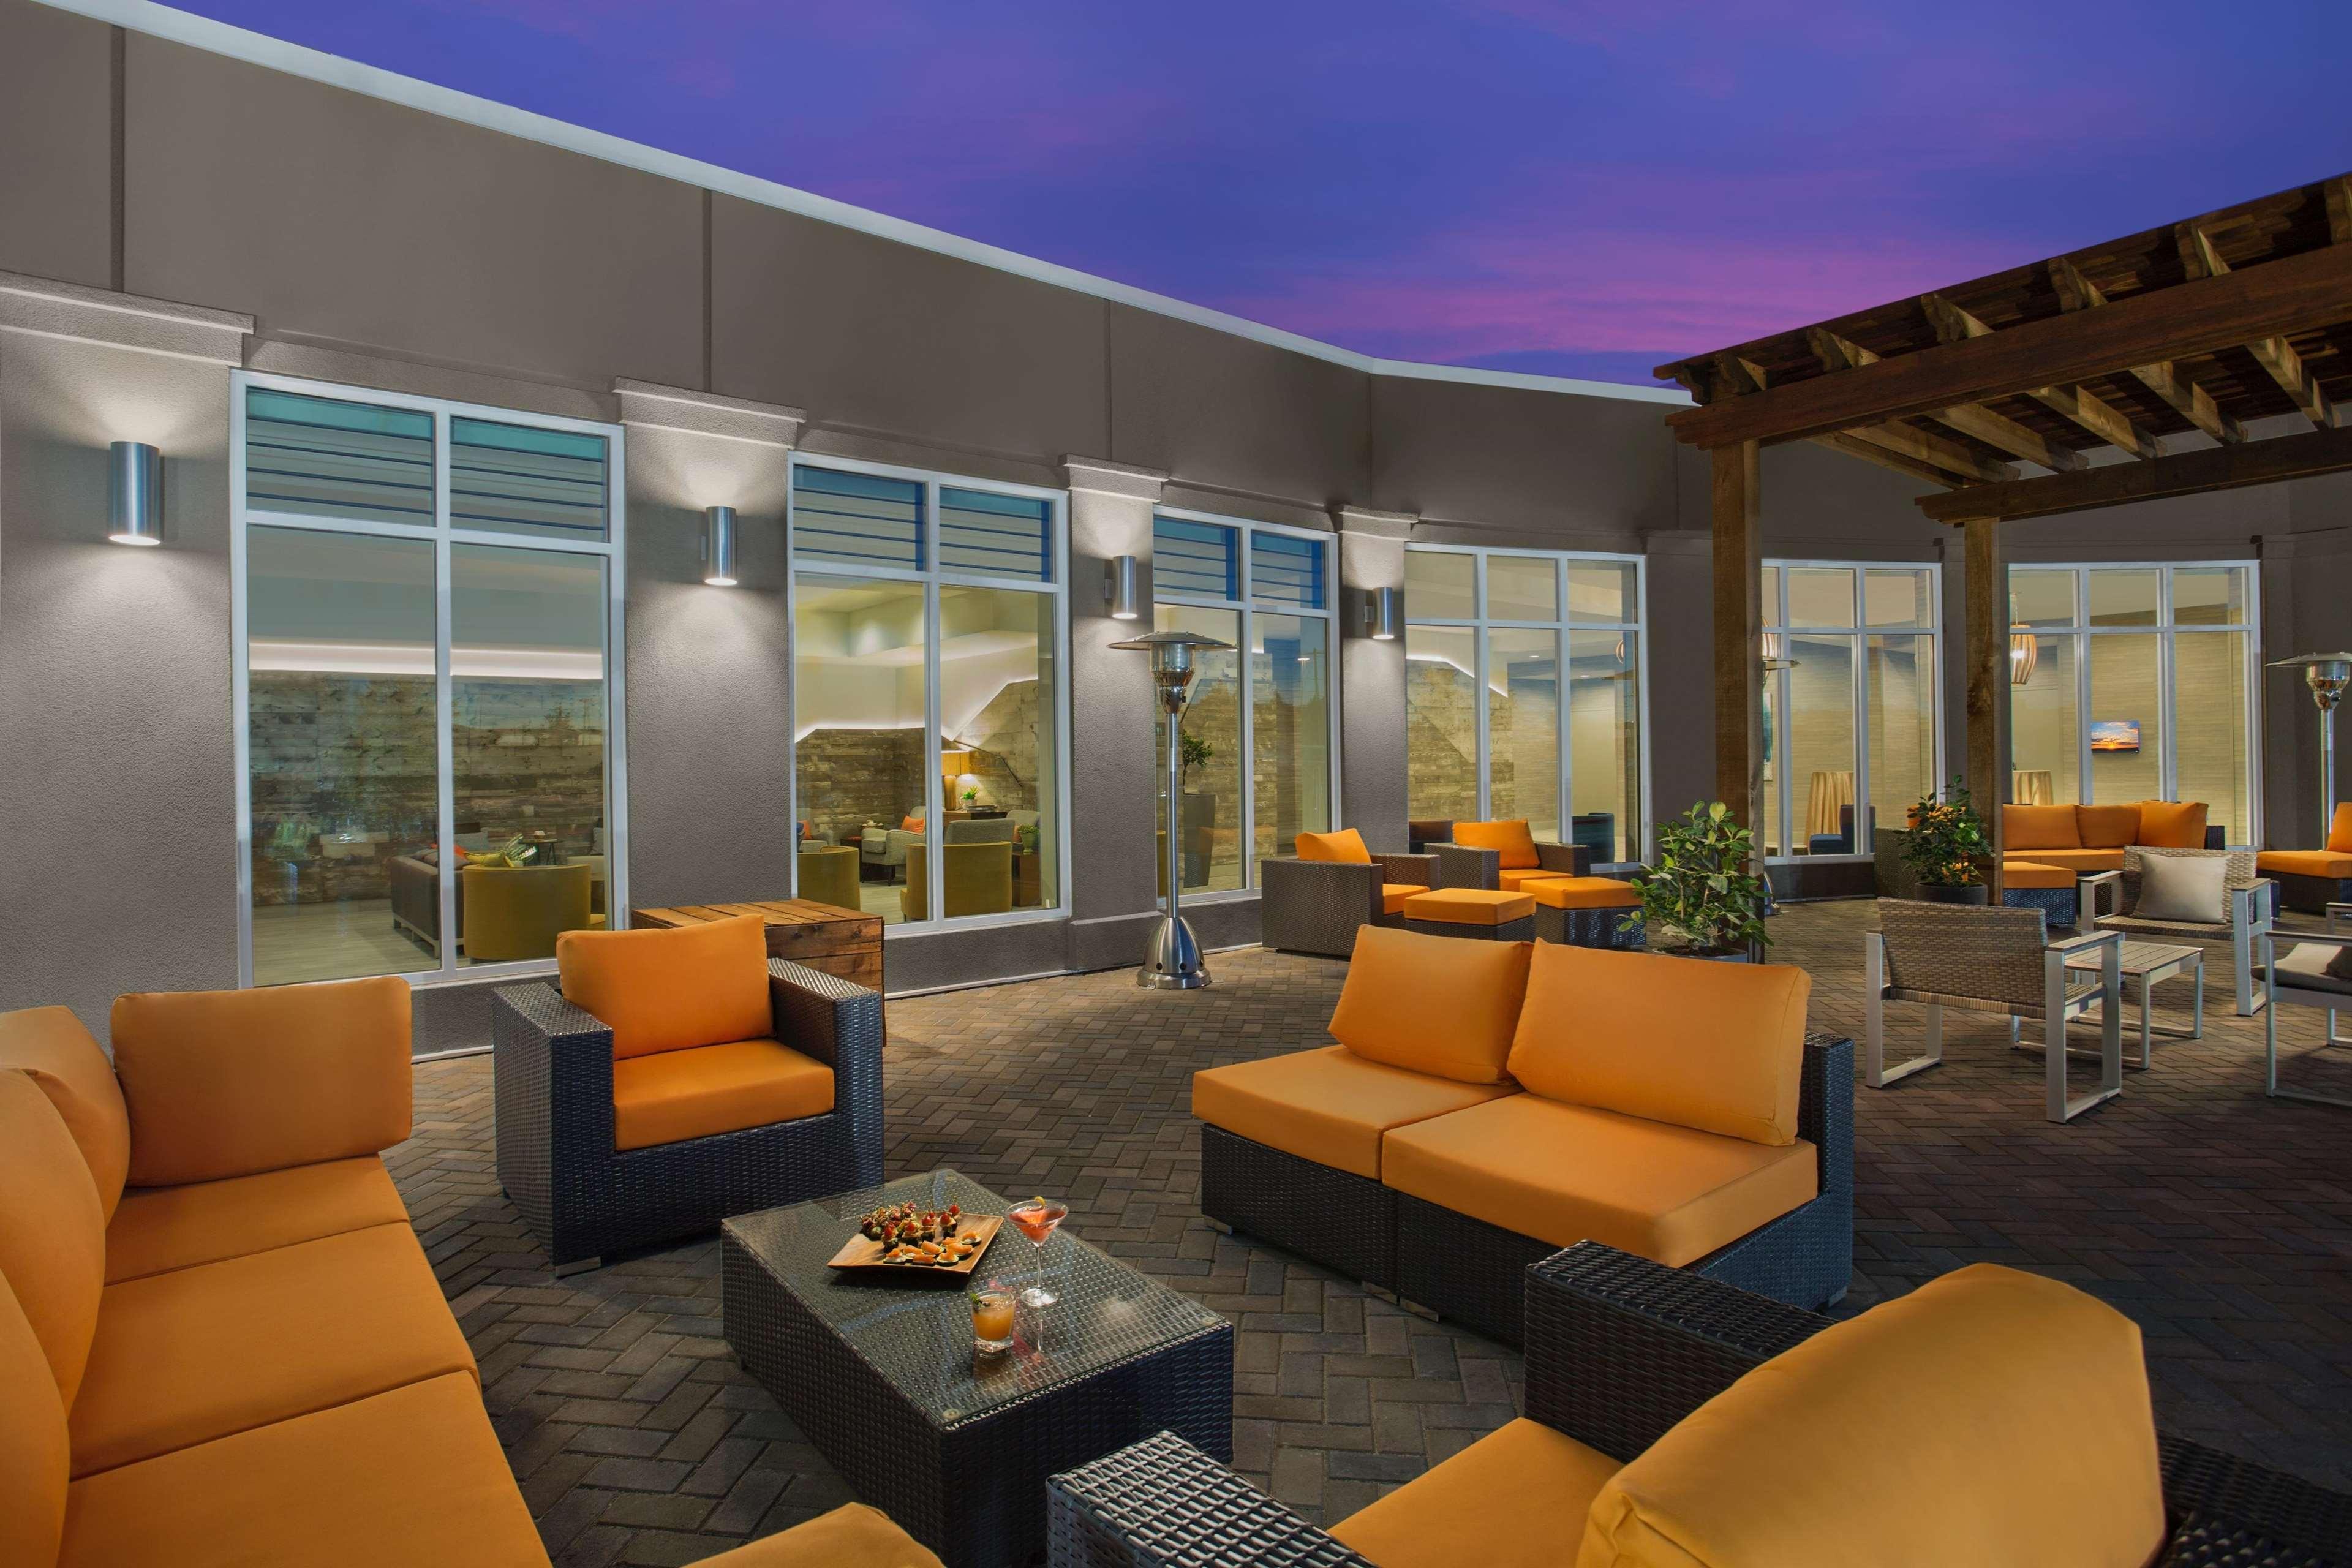 Hilton Garden Inn Lubbock 6027 45th Street Lubbock, TX Hotels ...